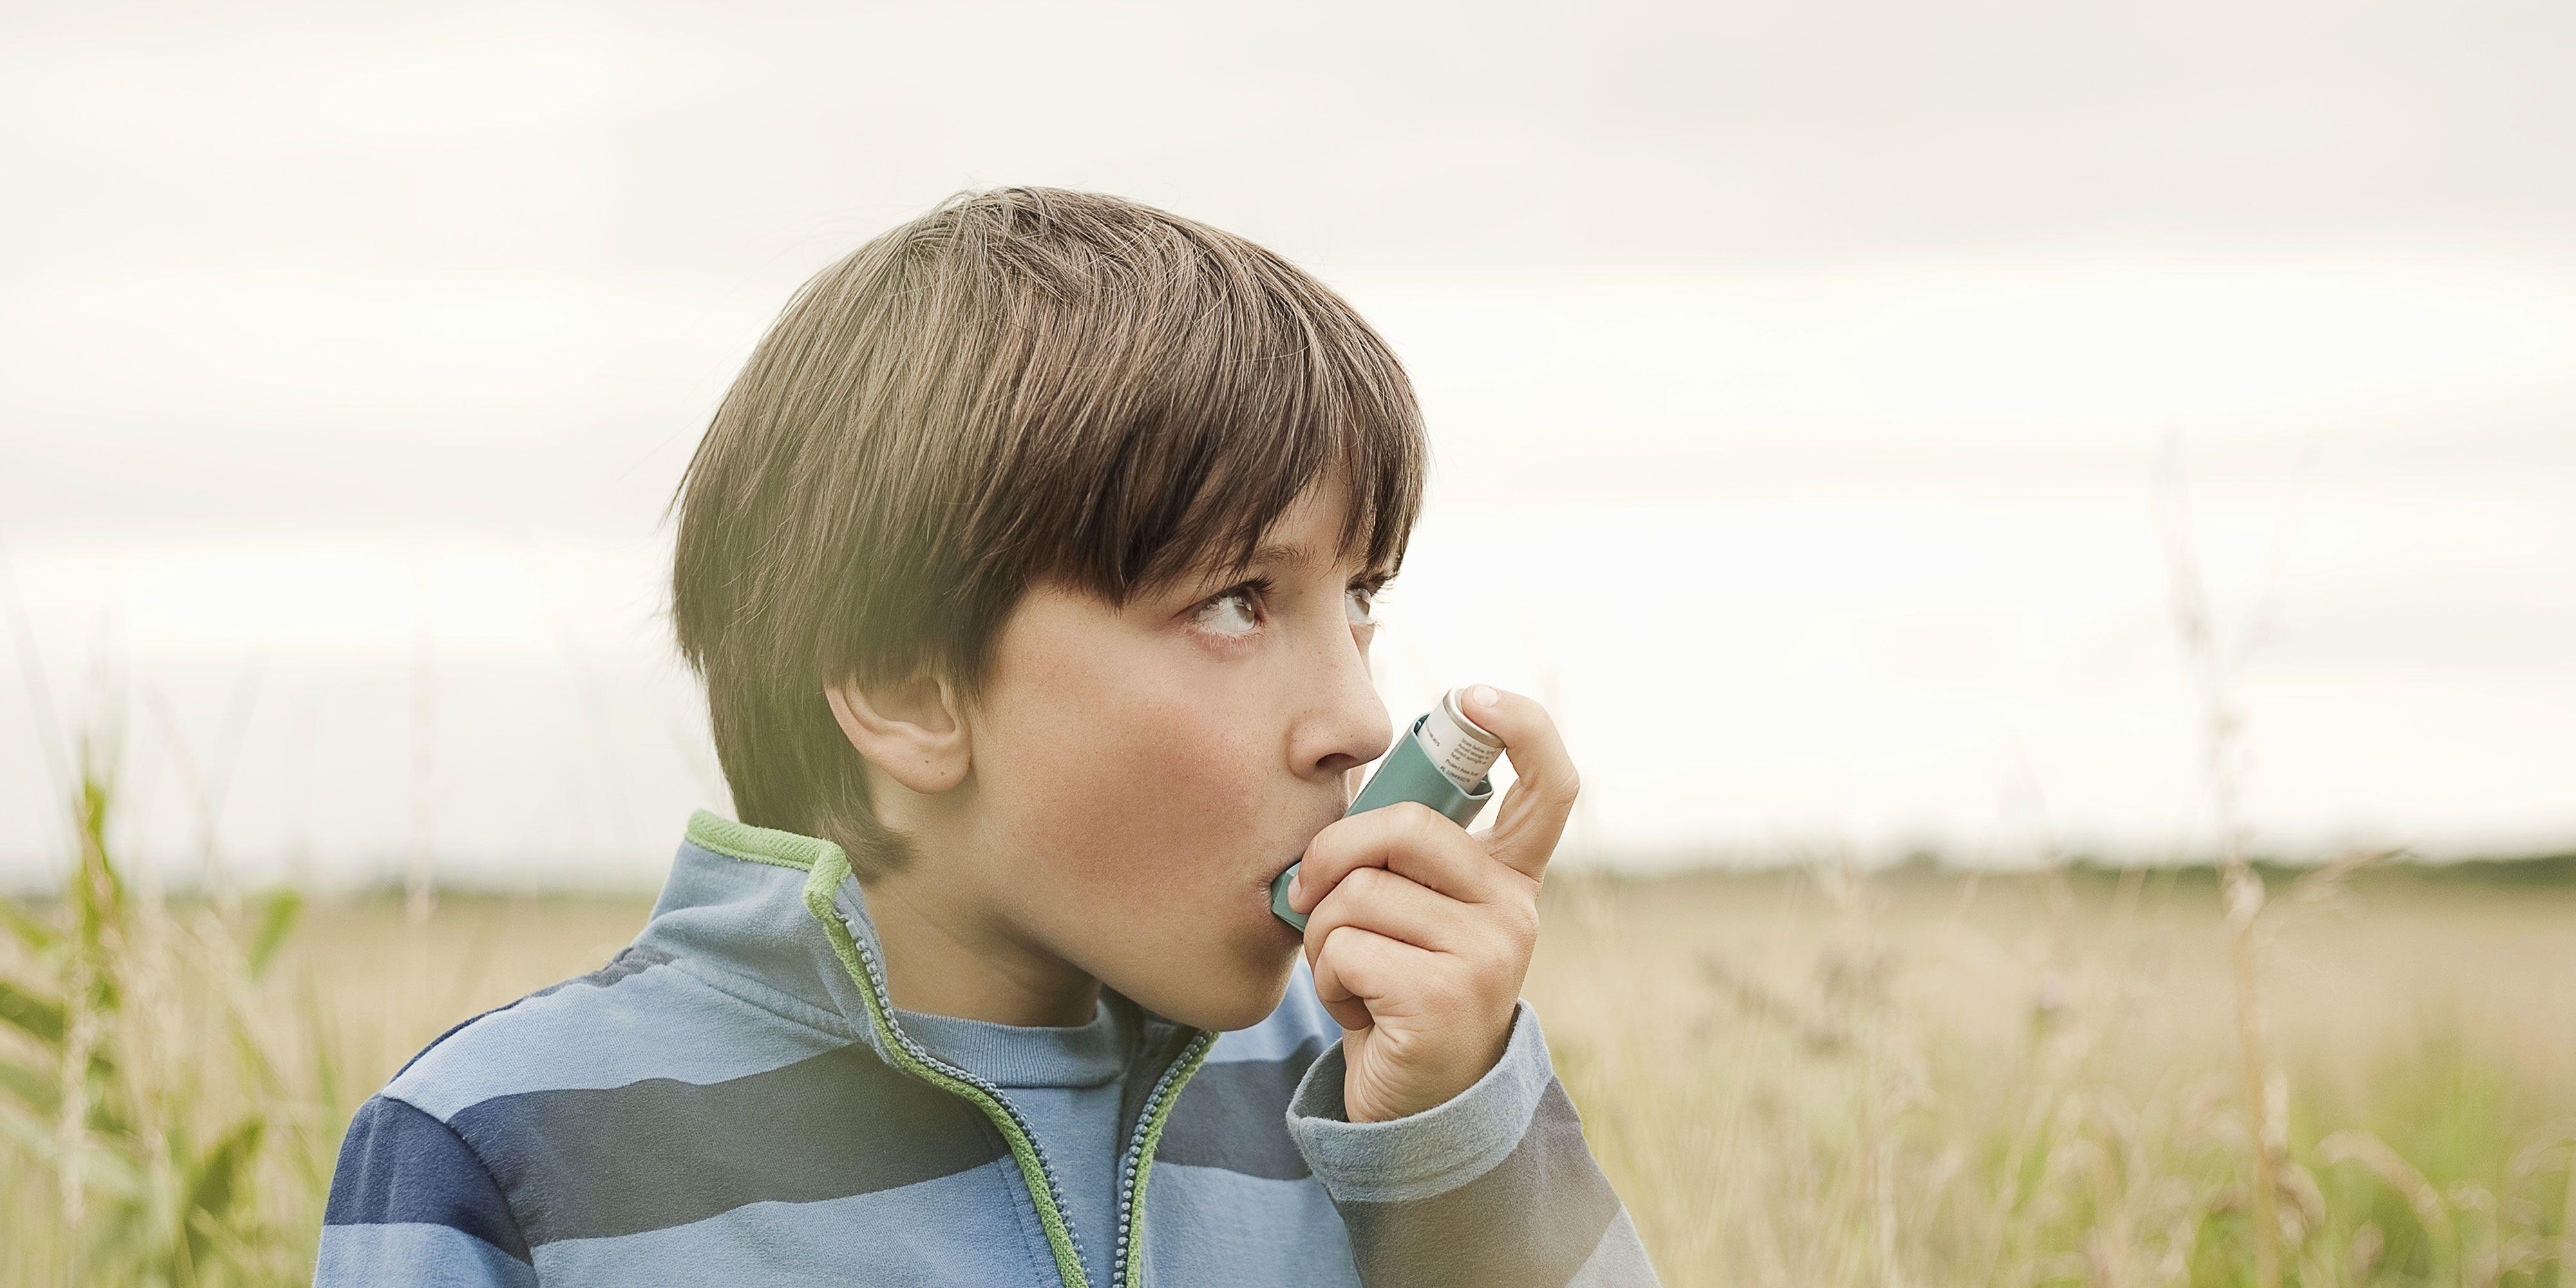 Seretide inhaler (fluticasone and salmeterol): usage, dosage